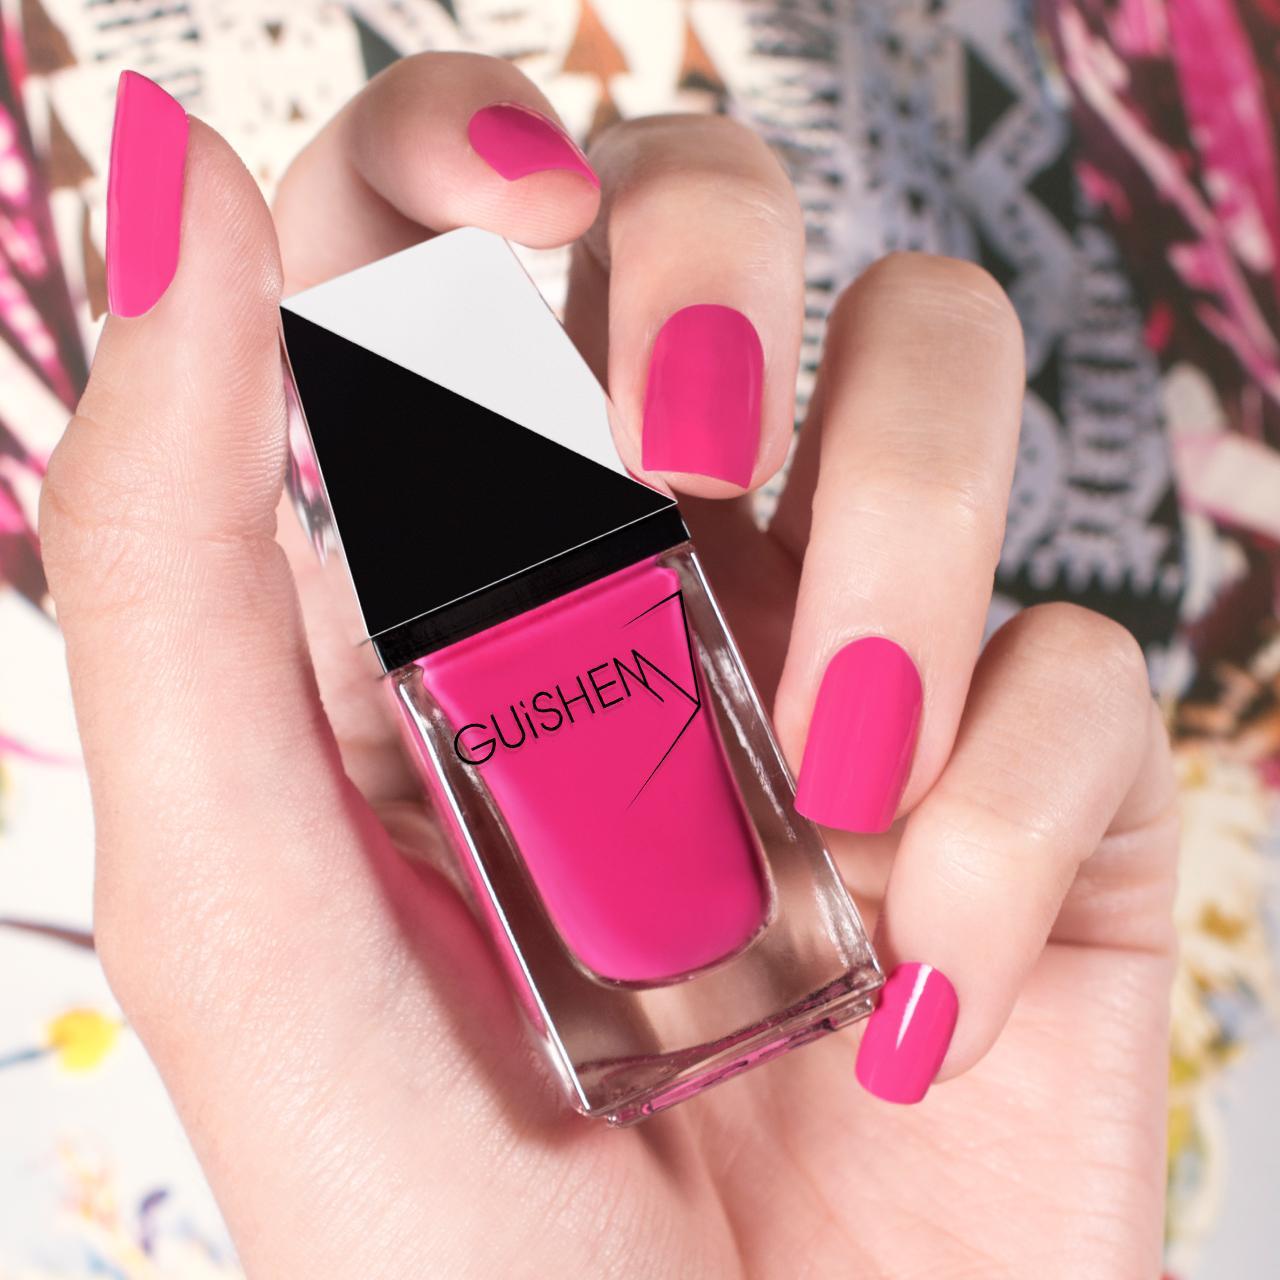 GUiSHEM Premium Nail Lacquer Crème Hot Pink, Fiesta - 002